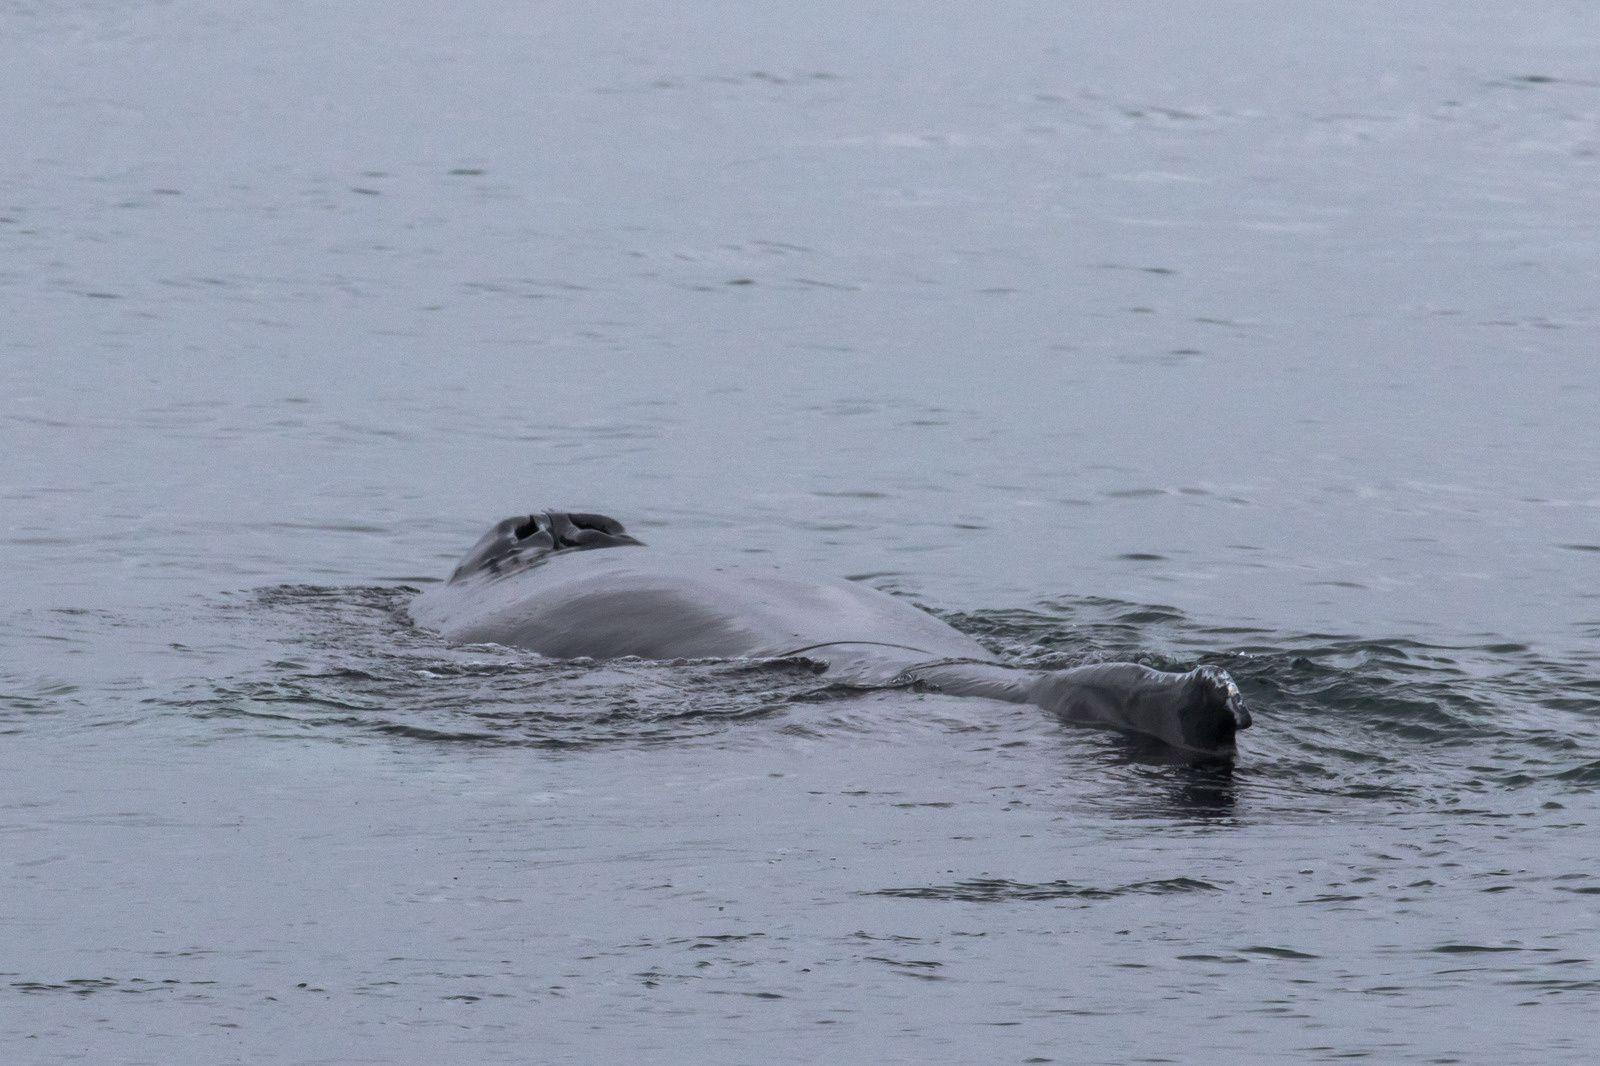 Islande: Baleines à Húsavík, Macareux et lac Mývatn !